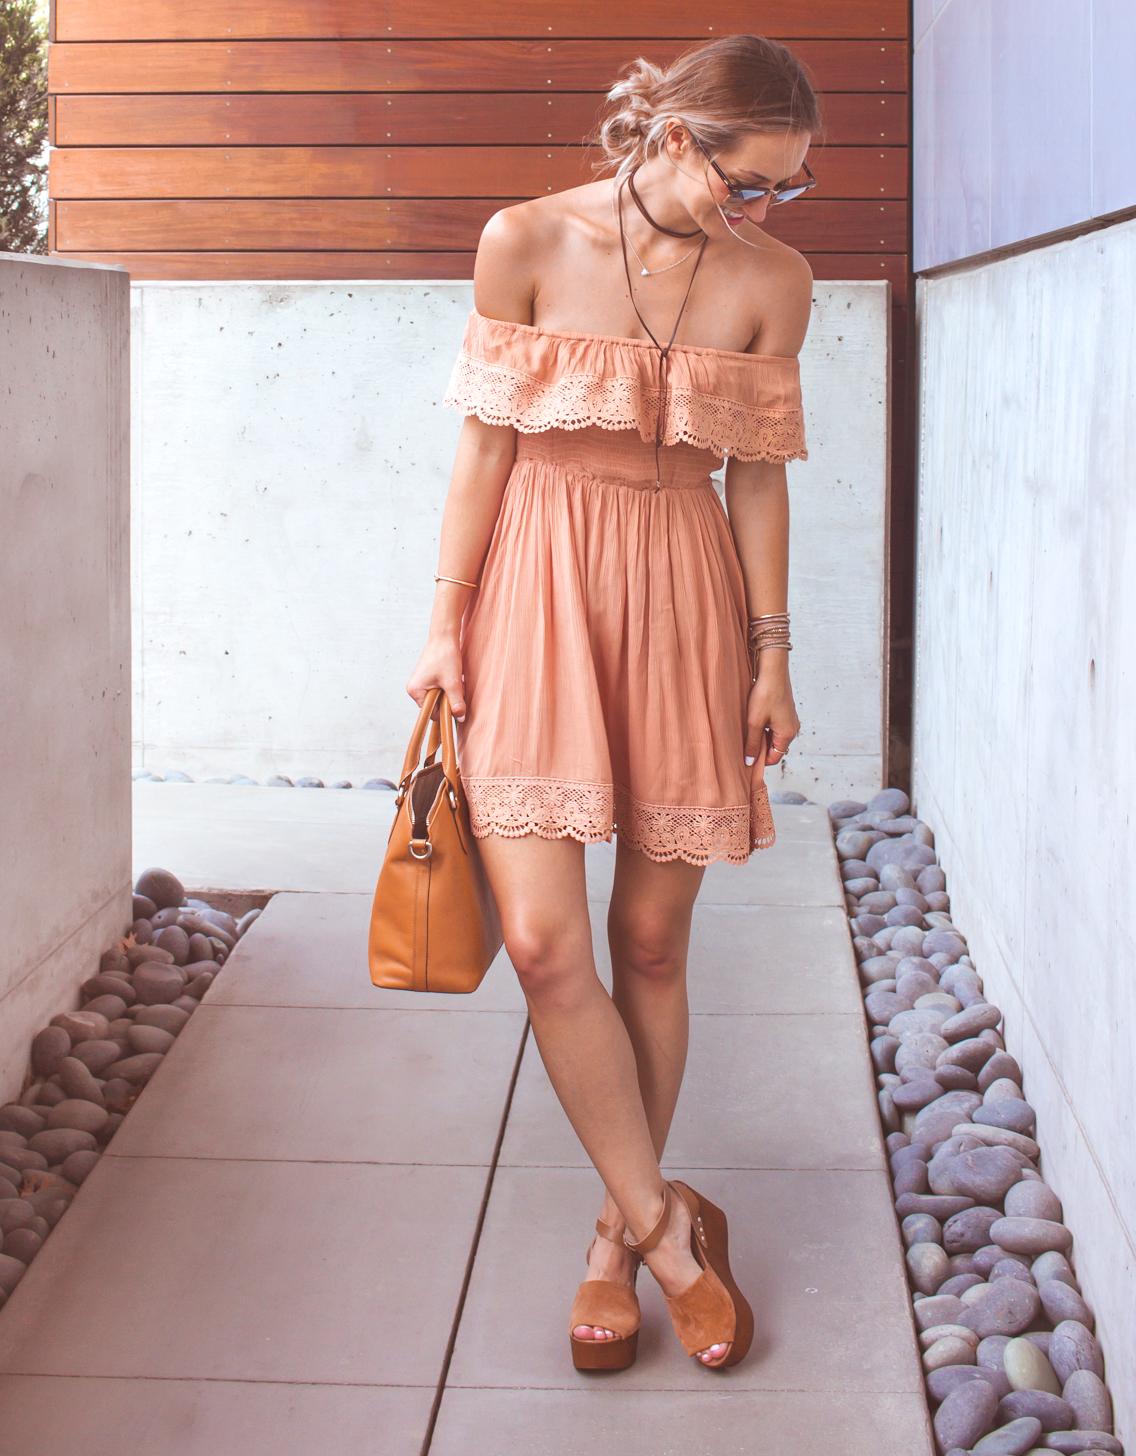 024723086c1 livvyland-blog-olivia-watson-austin-texas-fashion-lifestyle-